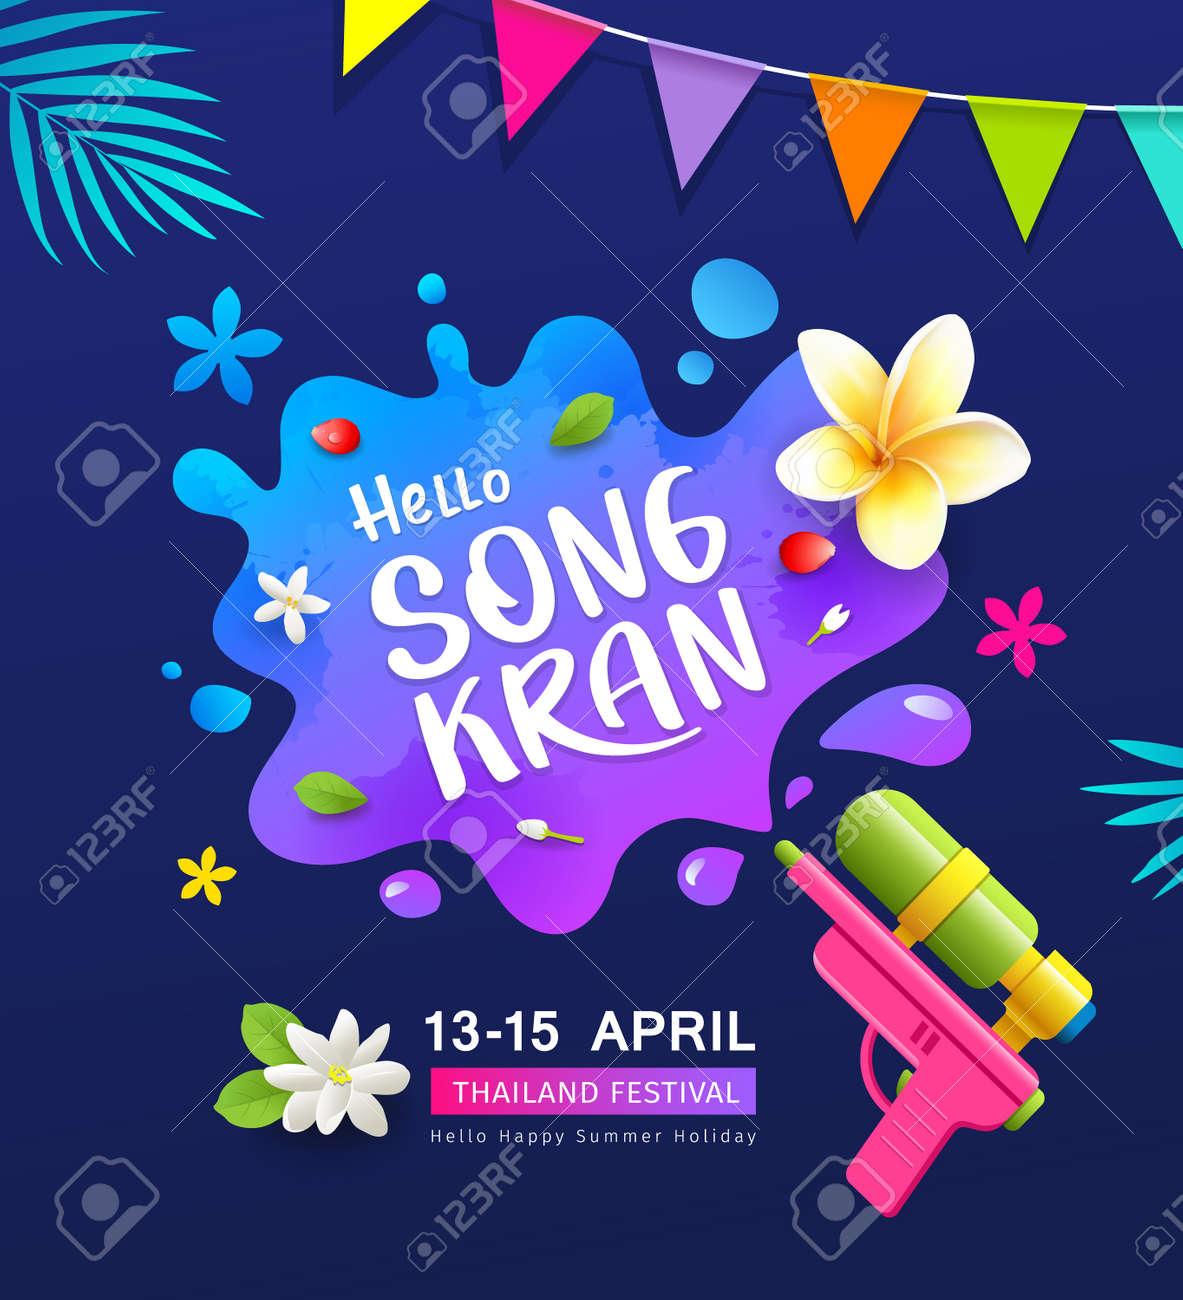 Songkran thailand festival water gun and blue water splash, banner design colorful background, EPS 10, vector illustration - 166692556